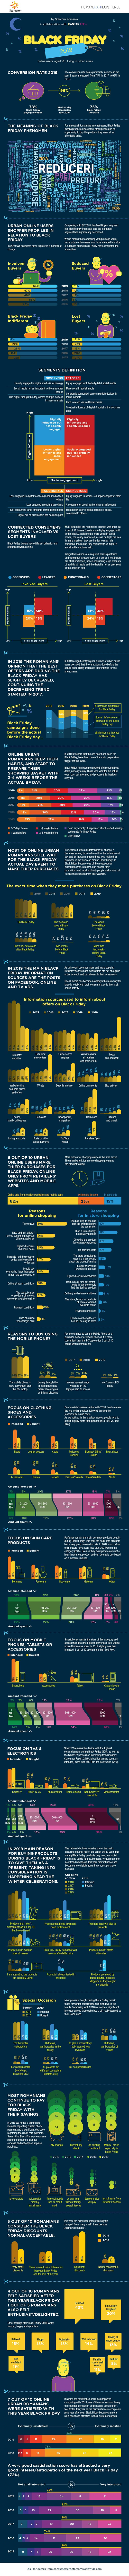 Infographic Black Friday